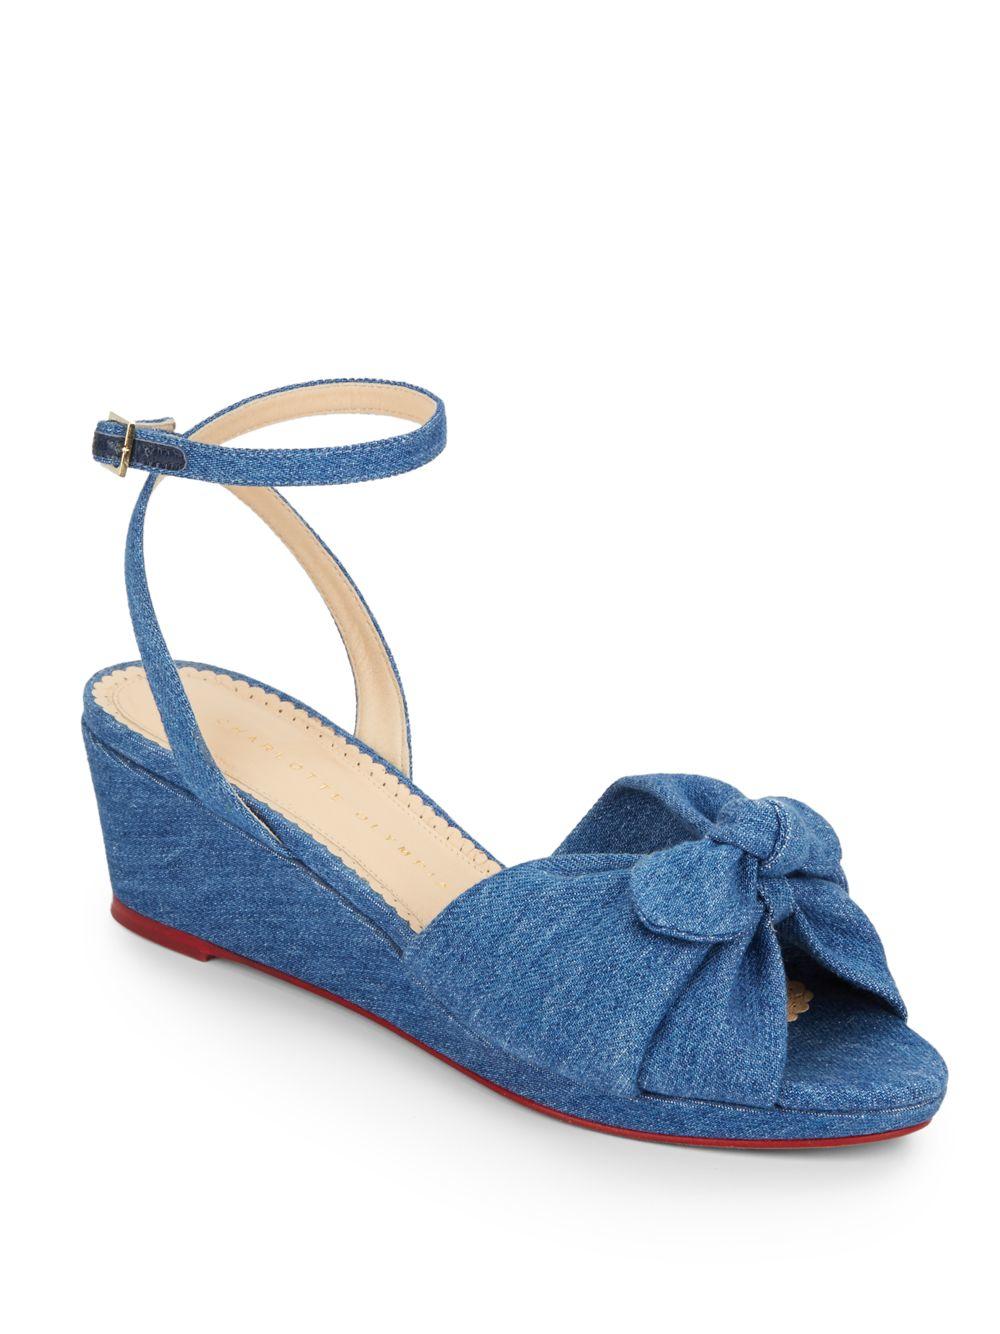 olympia denim wedge sandals in blue lyst